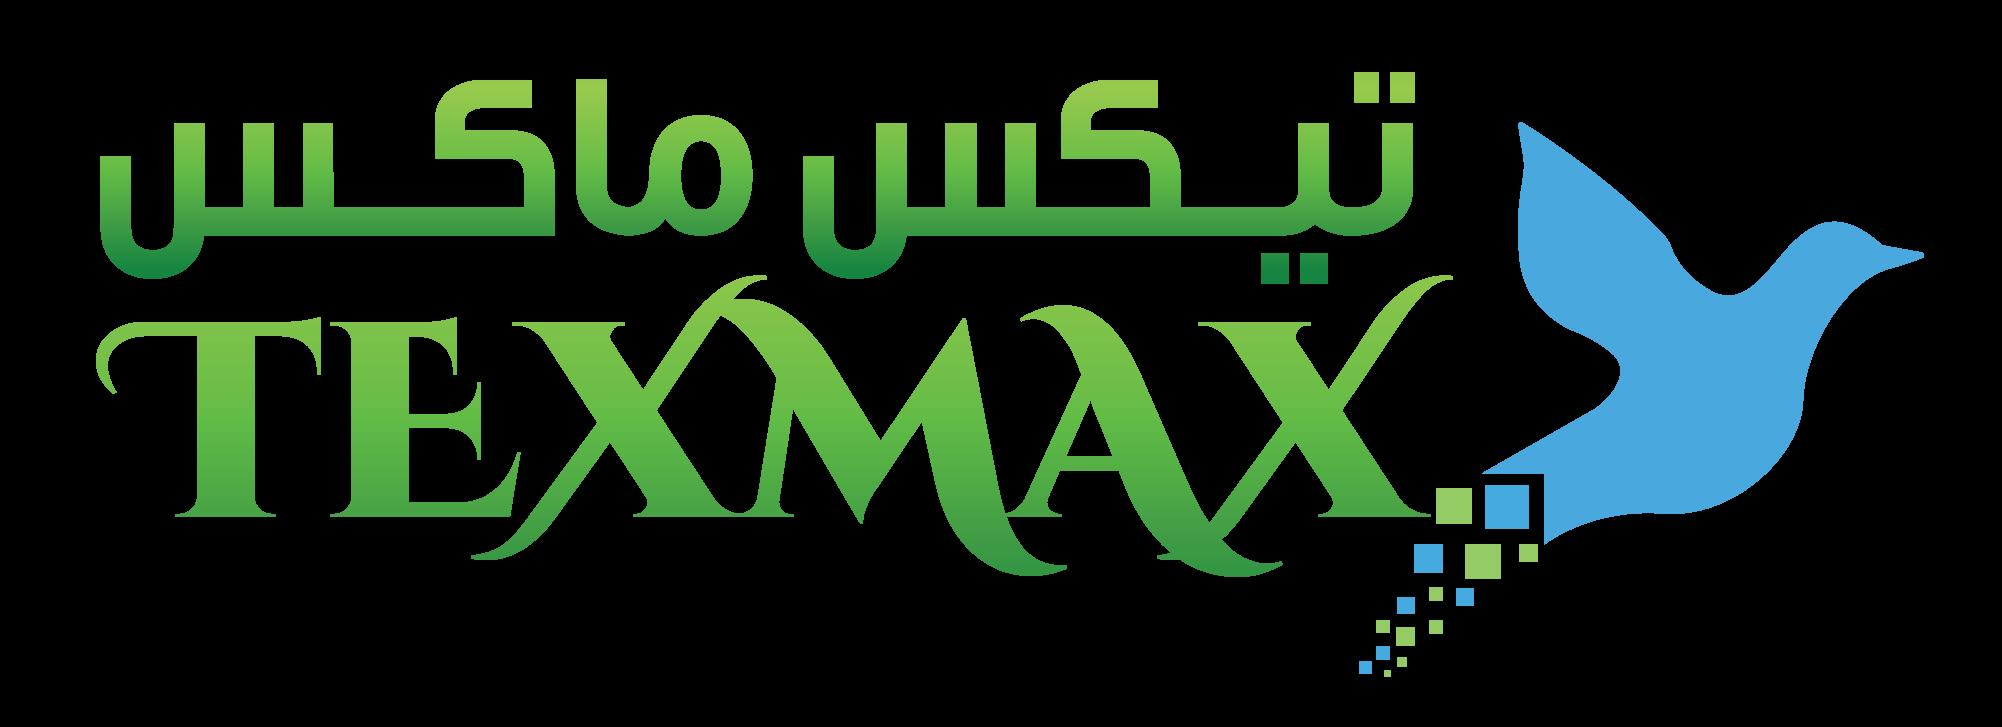 Texmax - Qatar eSouk | Shop Online